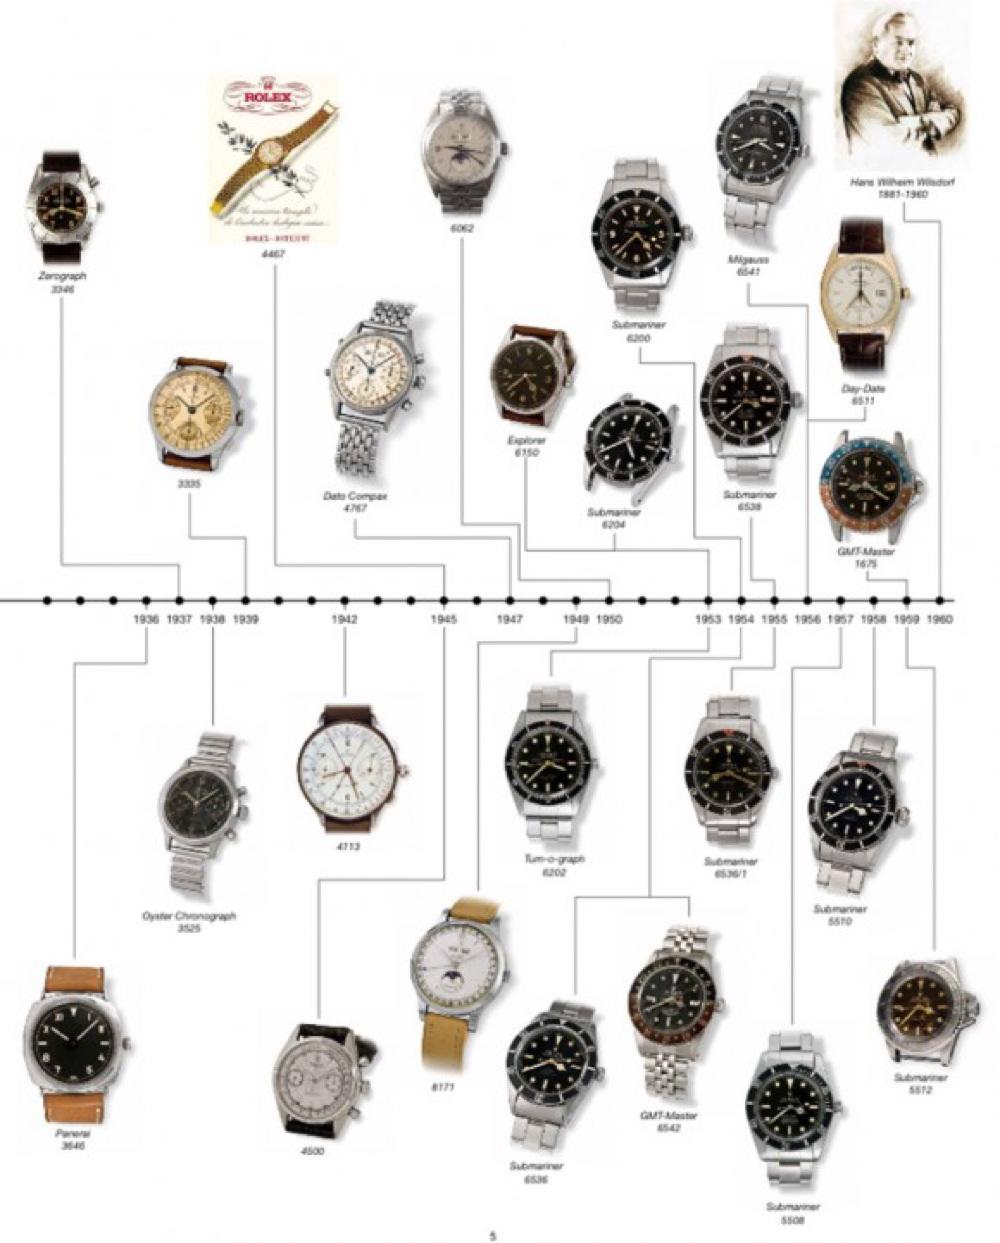 RPR_Rolex_History_2-580x721